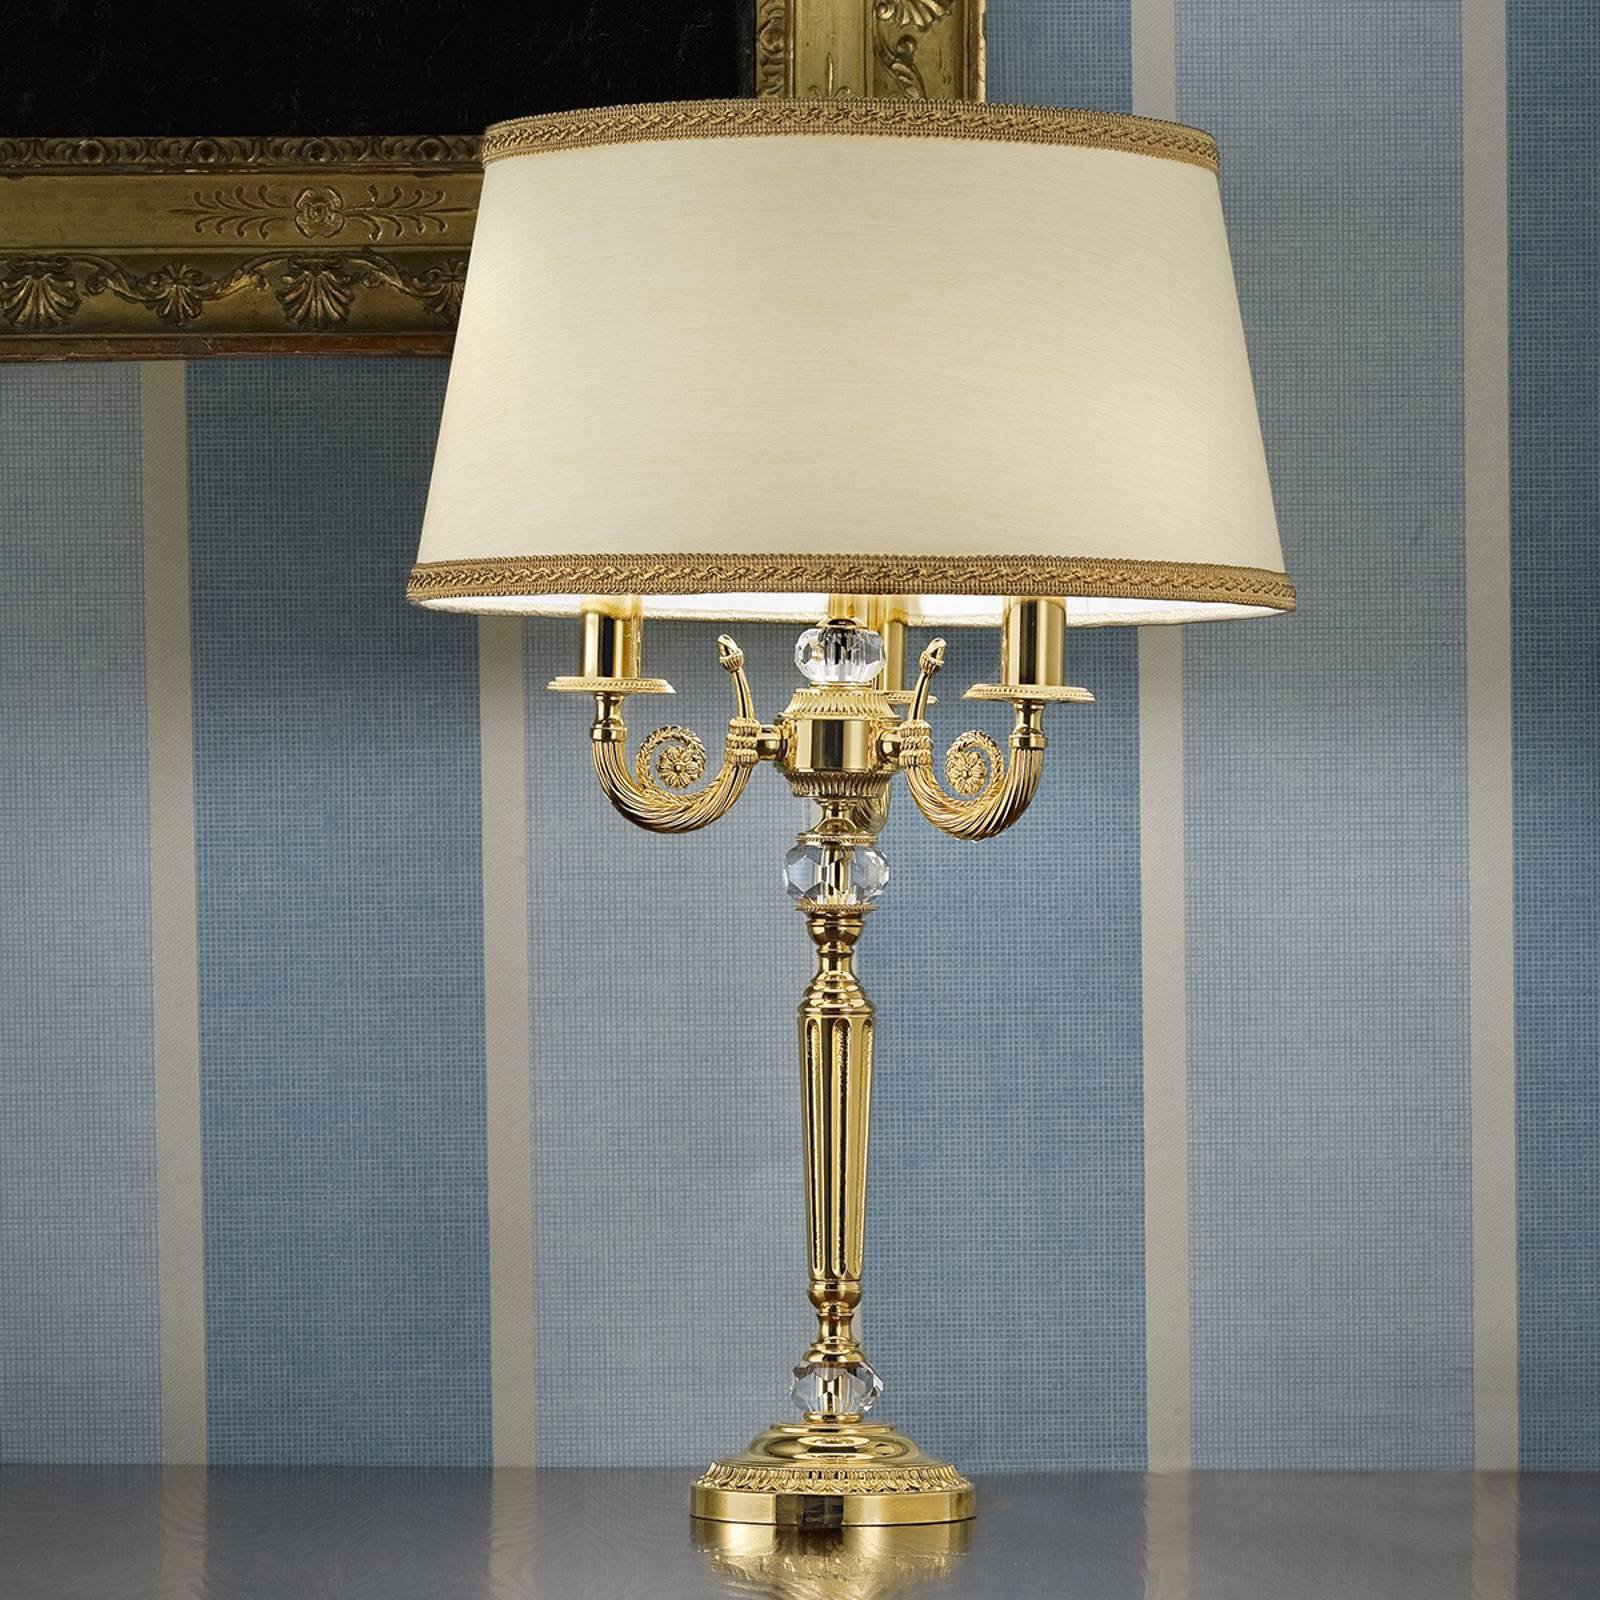 Nobel bordlampe Marvine, forgylt